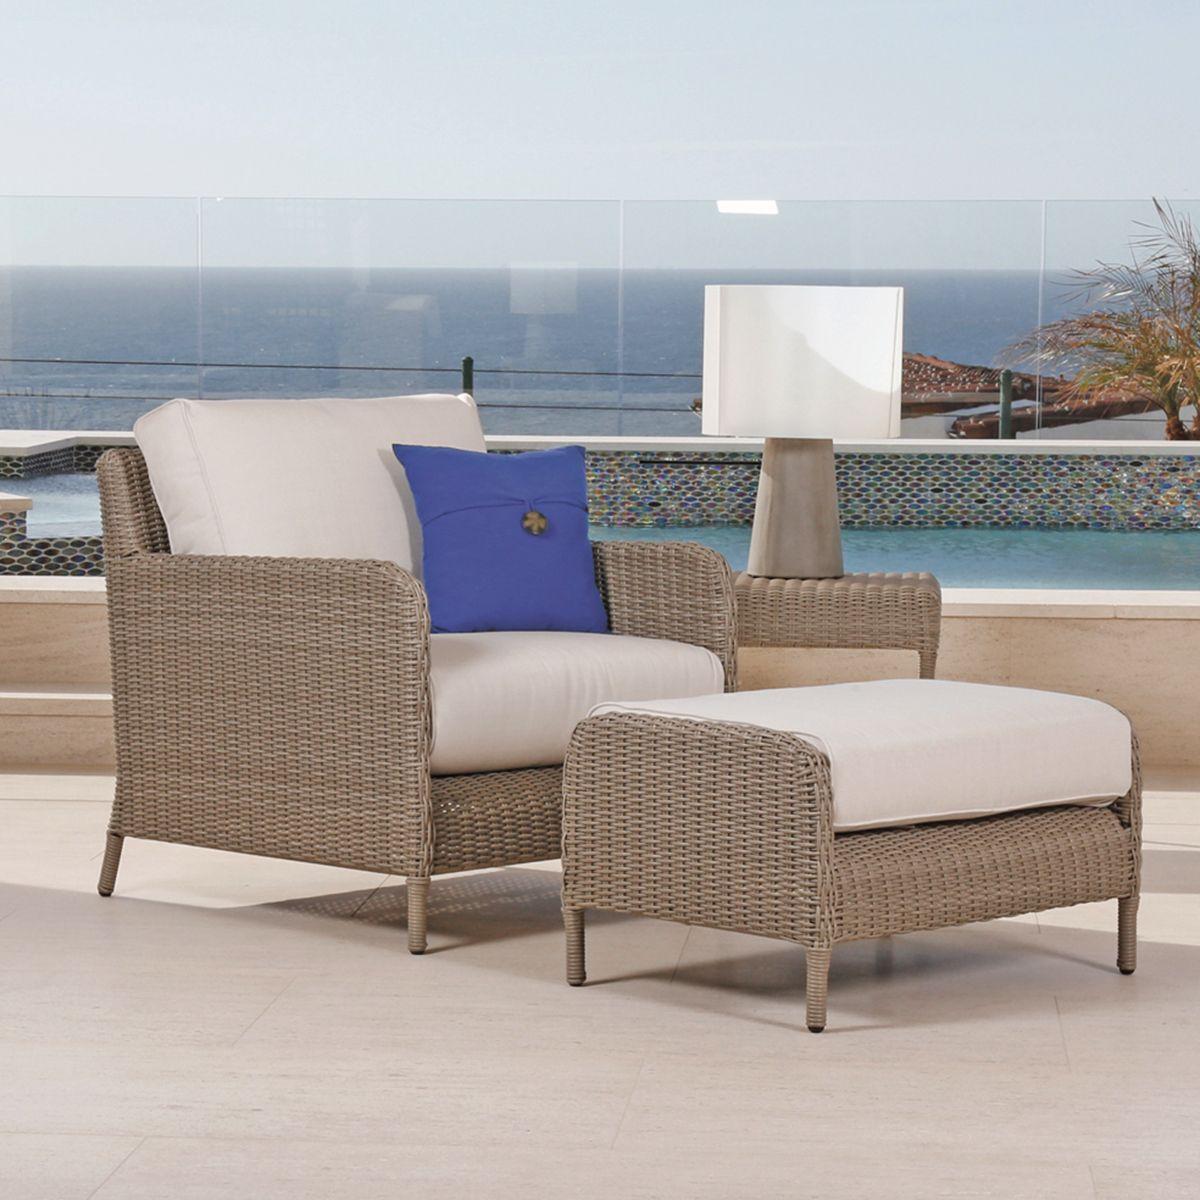 Melrose Club Chair Thos Baker Wicker Furniture Jpg 1200x1200 Baker Outdoor  Furniture